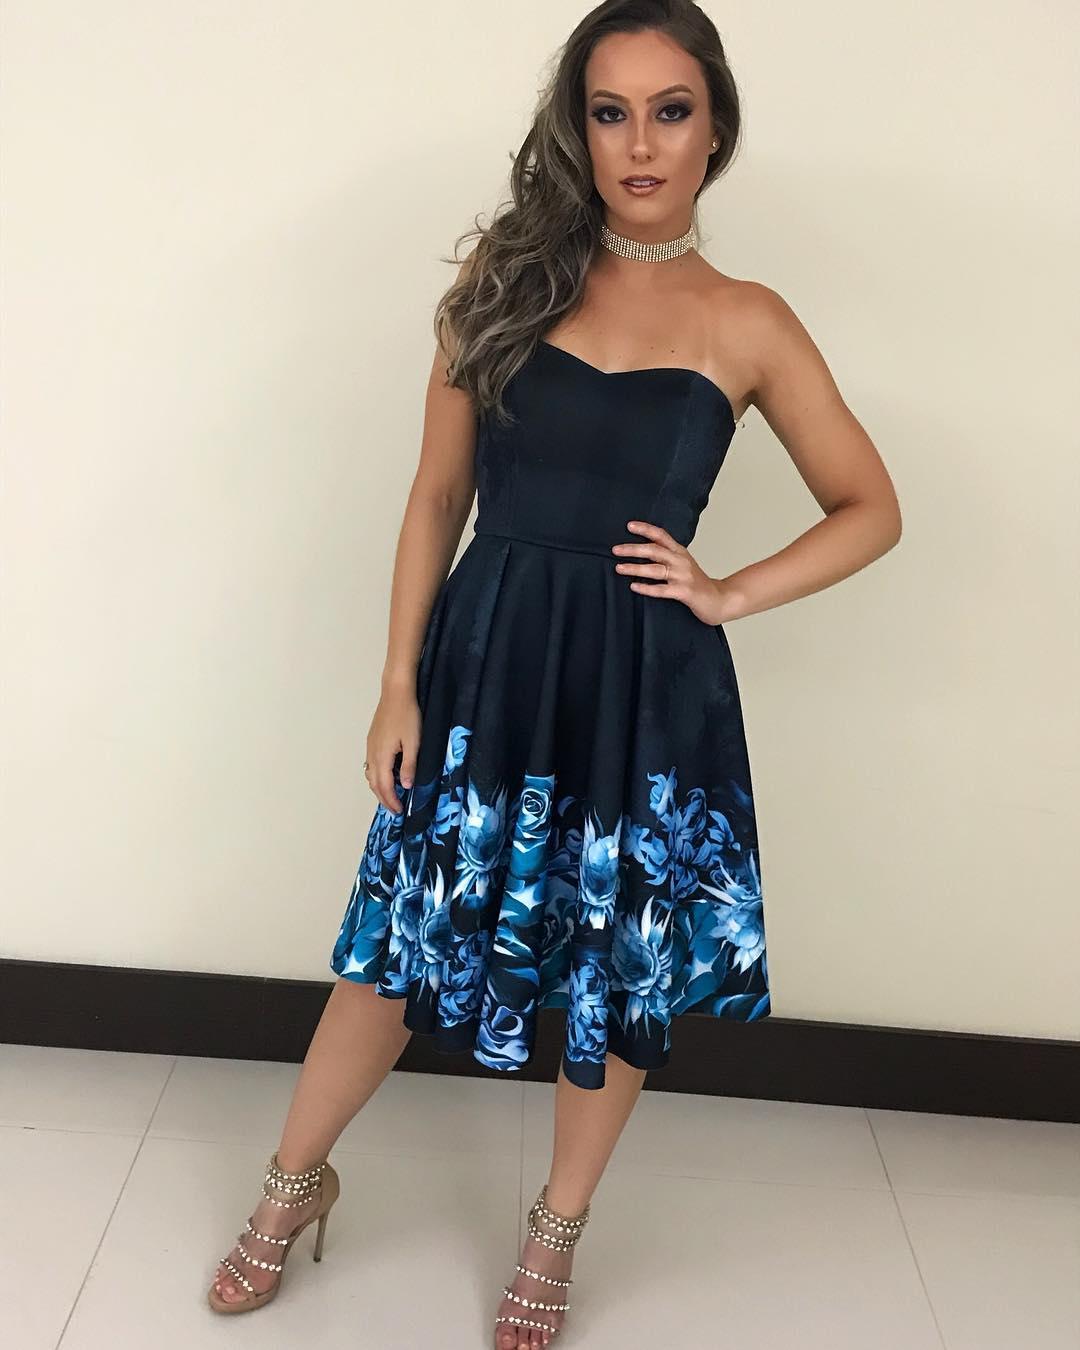 cristine boff sartor, segunda finalista de miss latinoamerica 2019. - Página 2 26336210